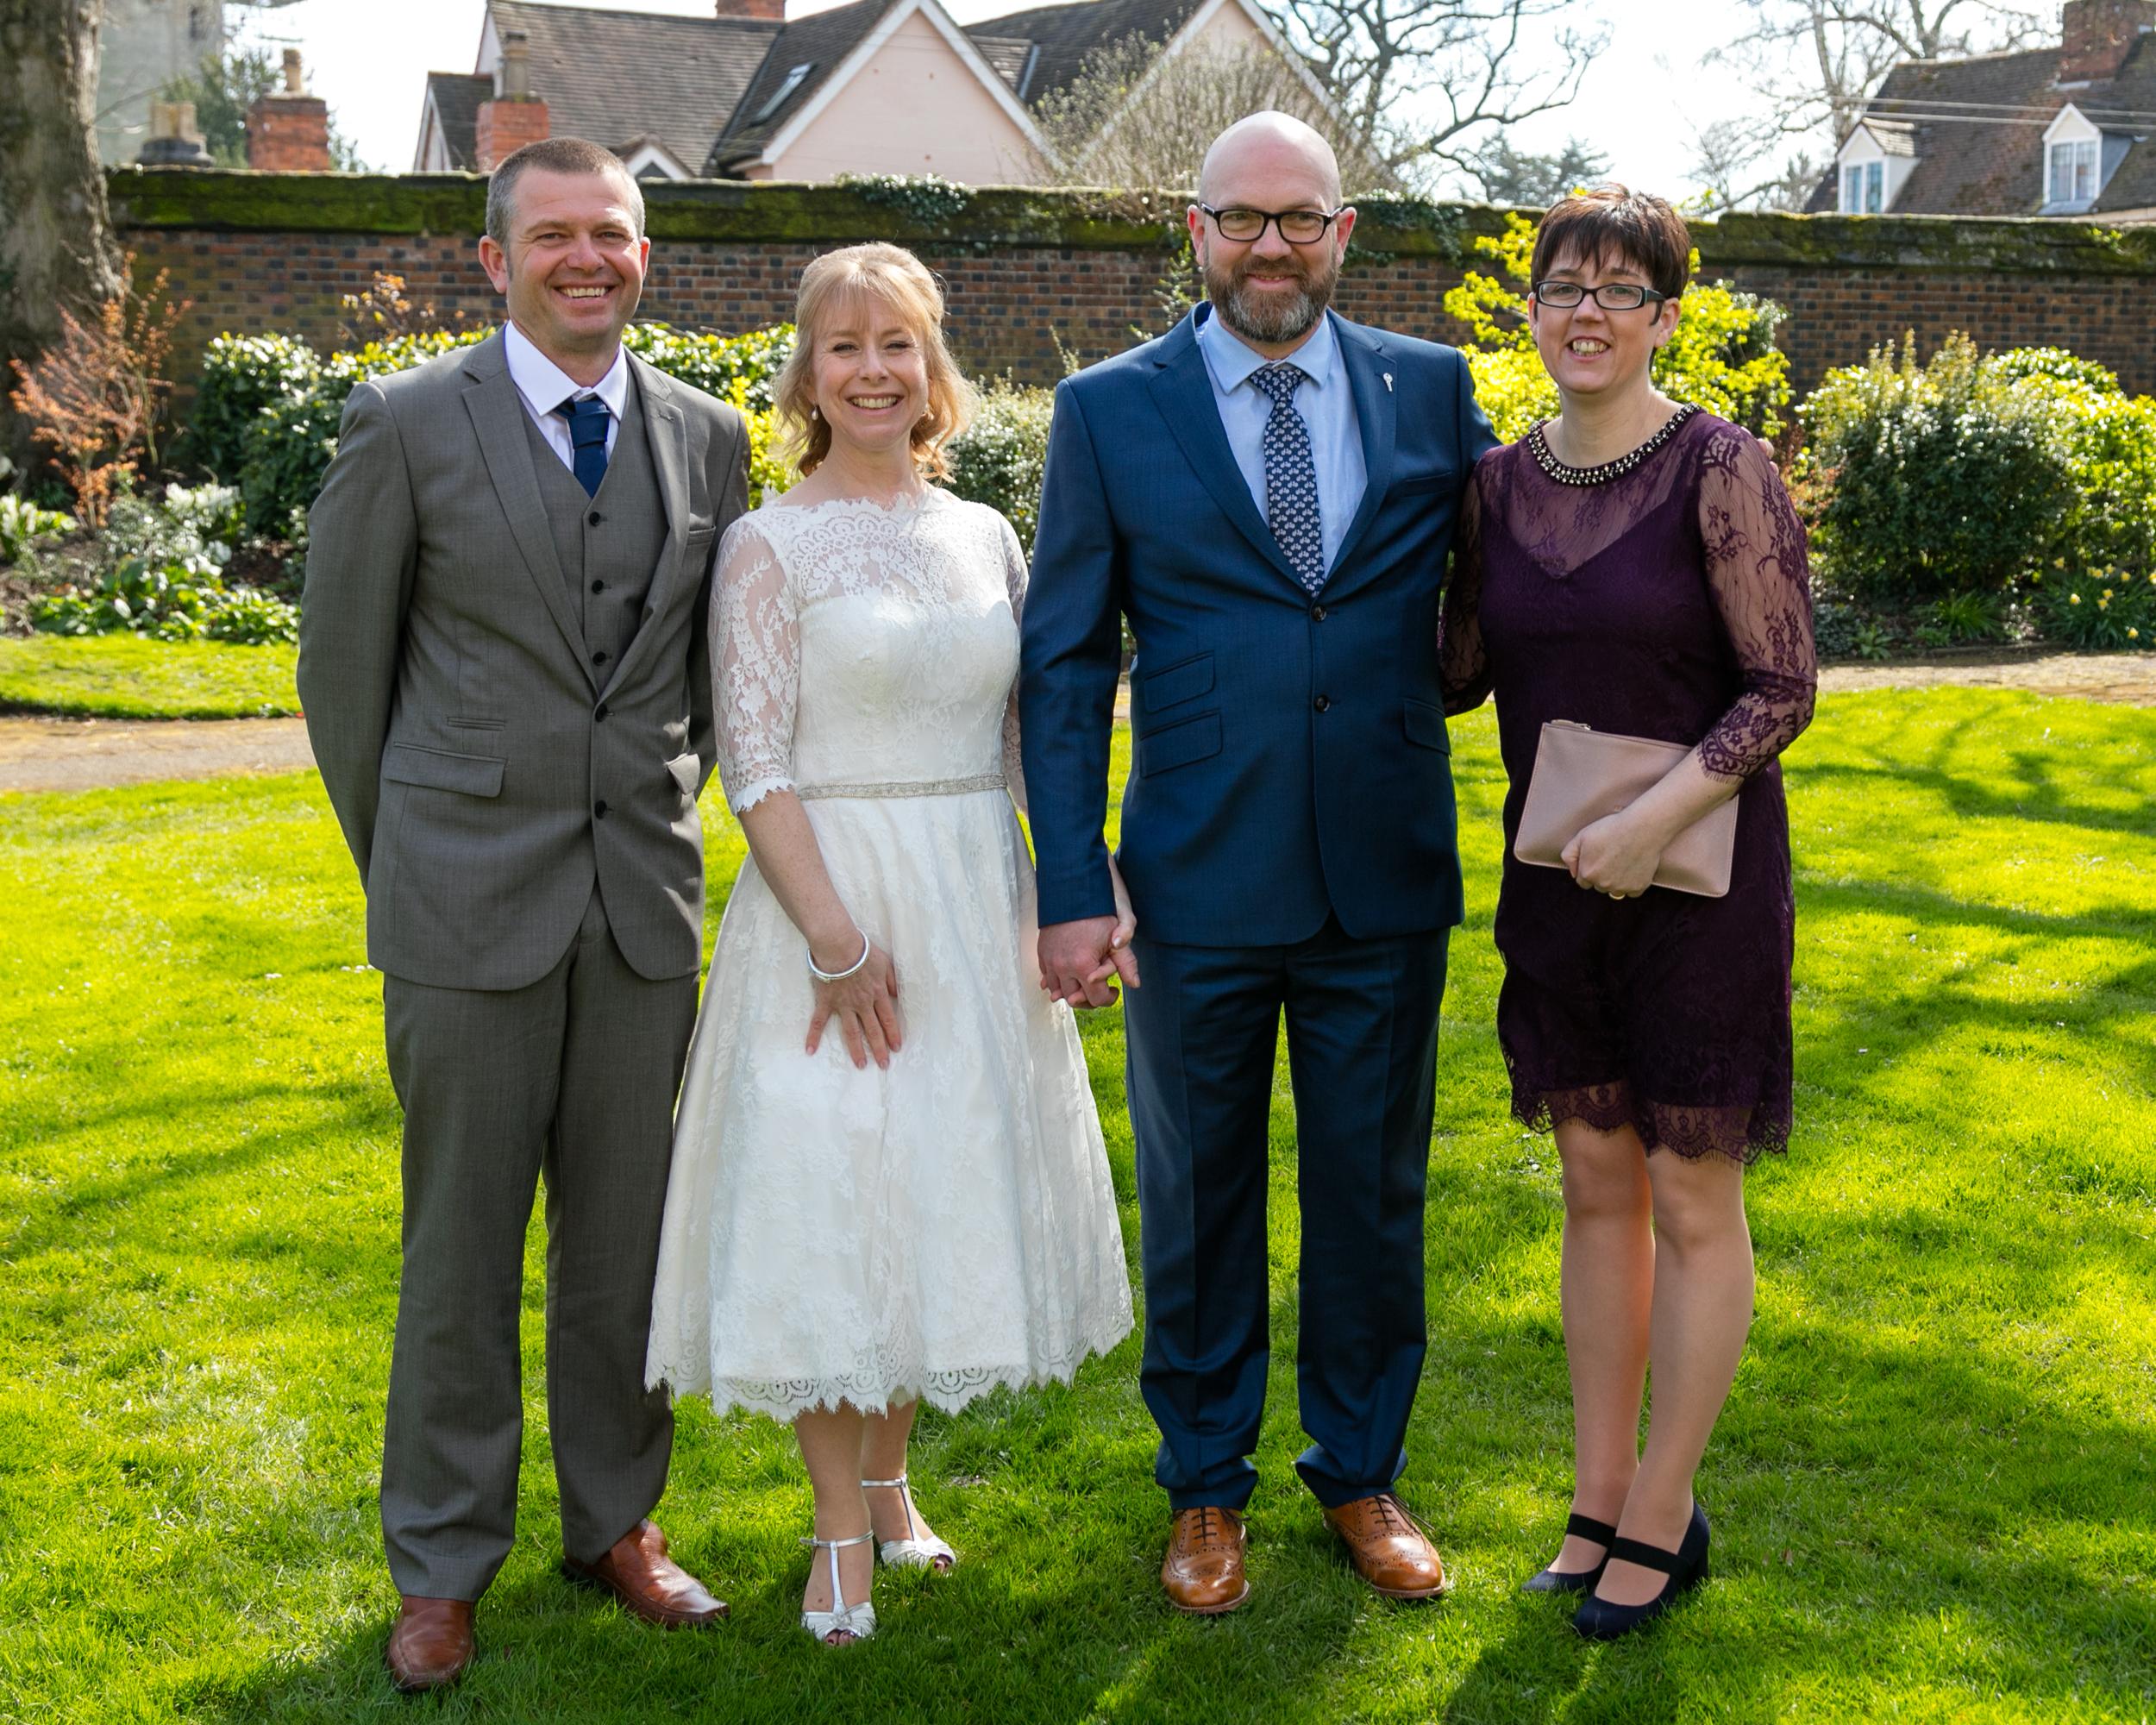 wedding-photography-at-Hill-Close-Gardens-Warwick58.jpg